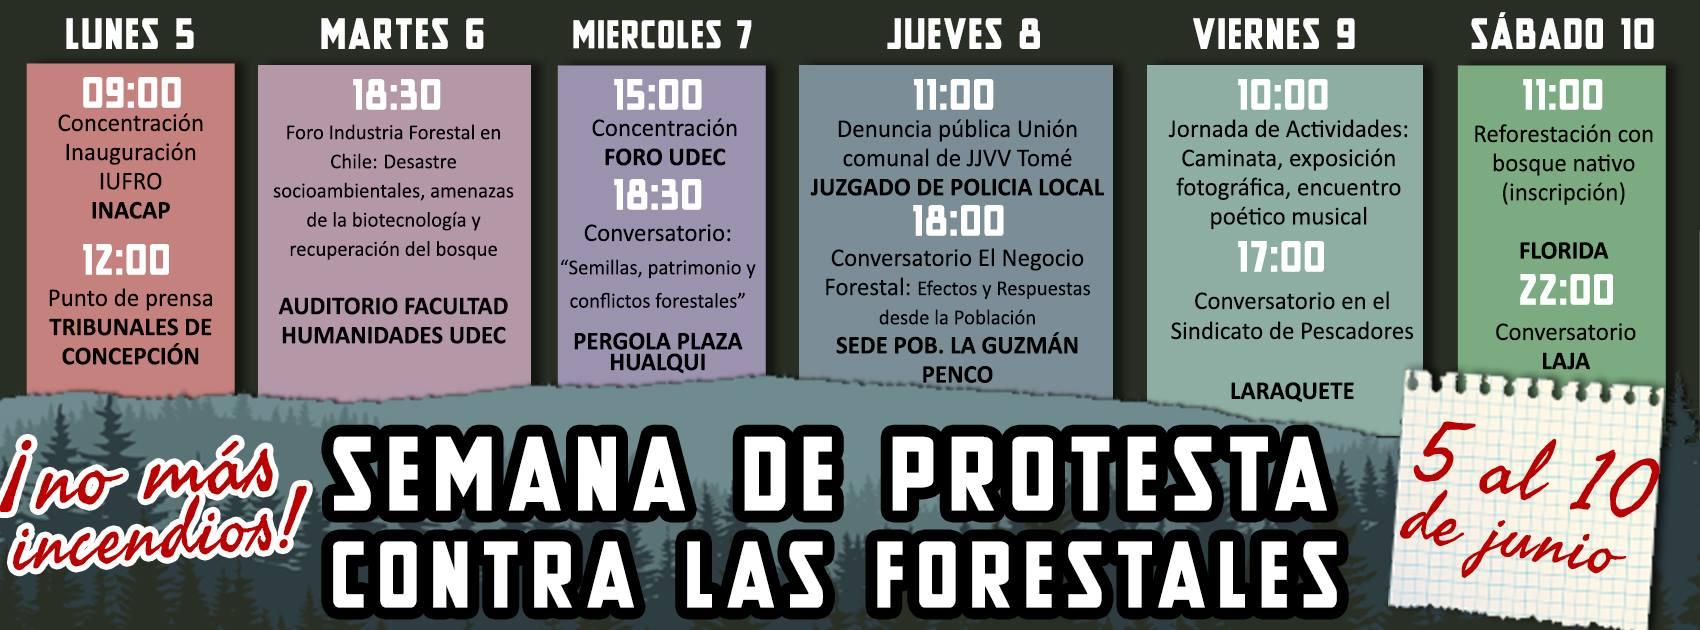 cronograma forestales.jpg